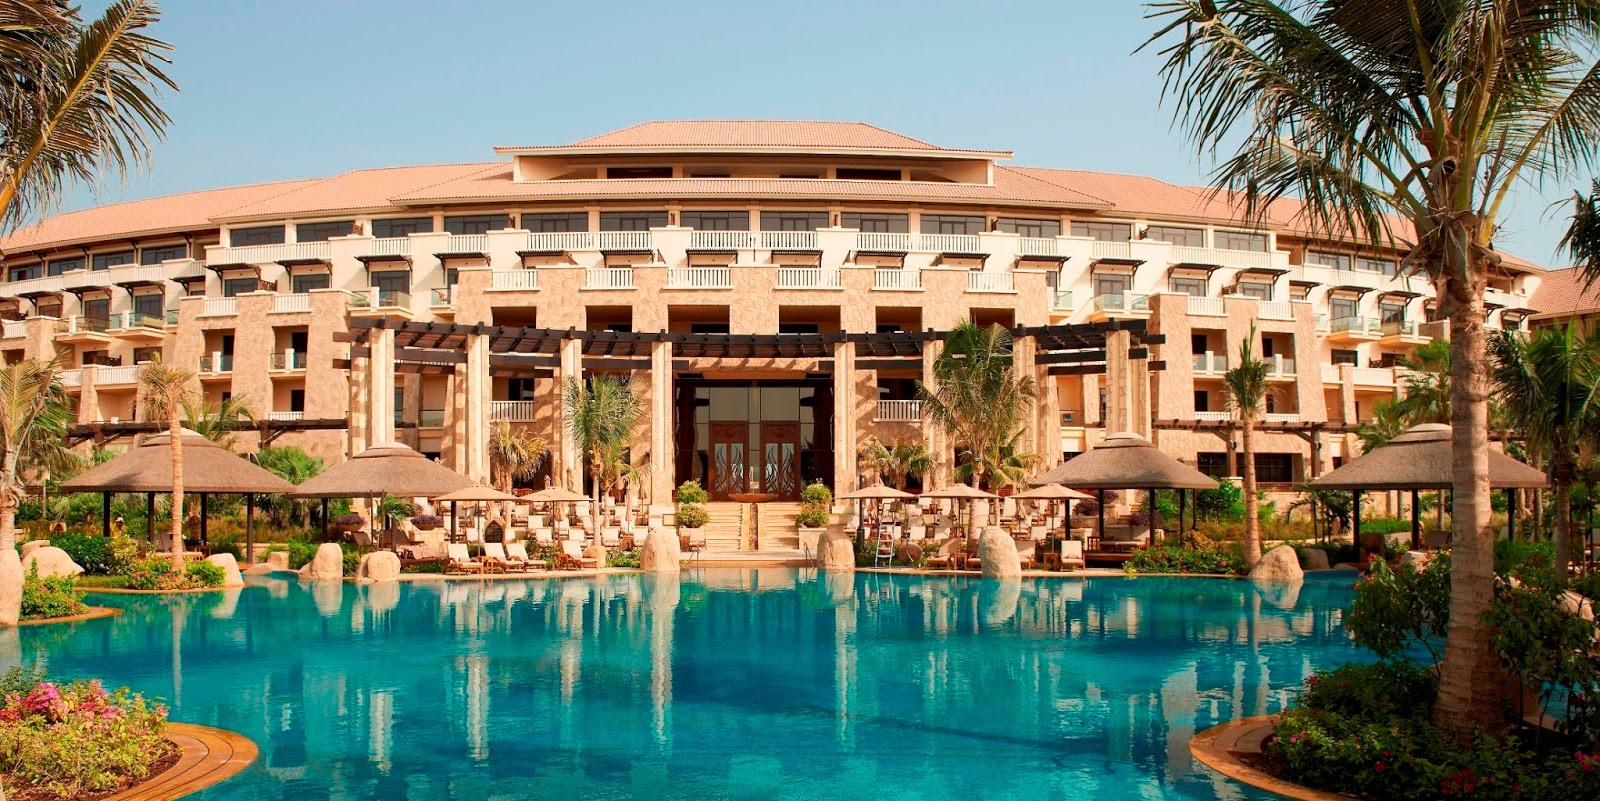 Dubai constructions update by imre solt sofitel first for Dubai palm hotel